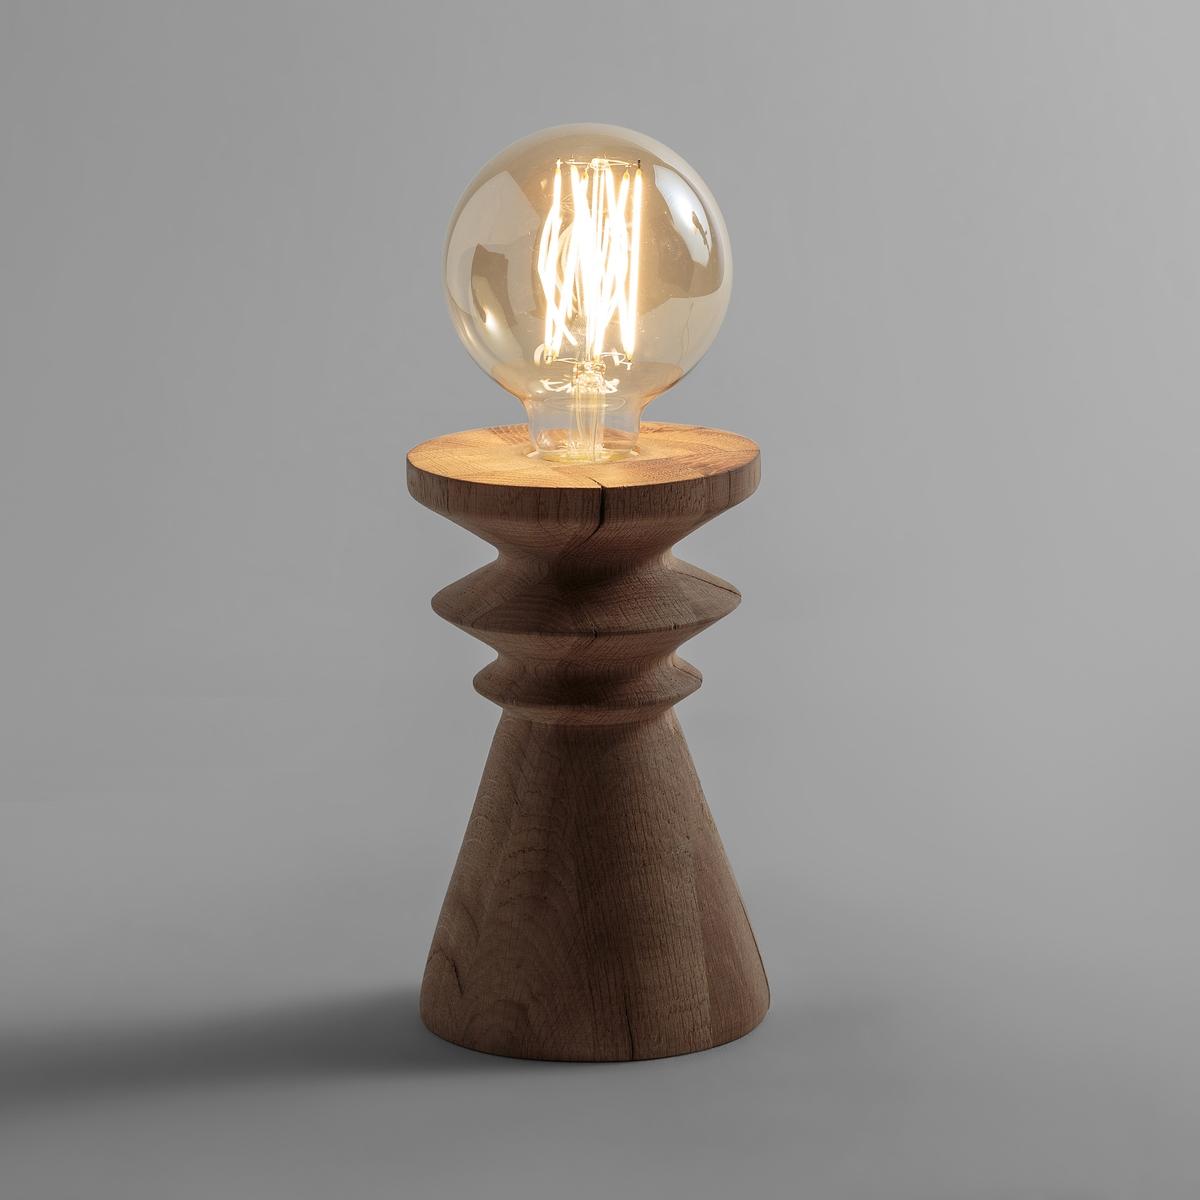 Lampada LED decorativa attacco grosso Ø9,5xA14 cm